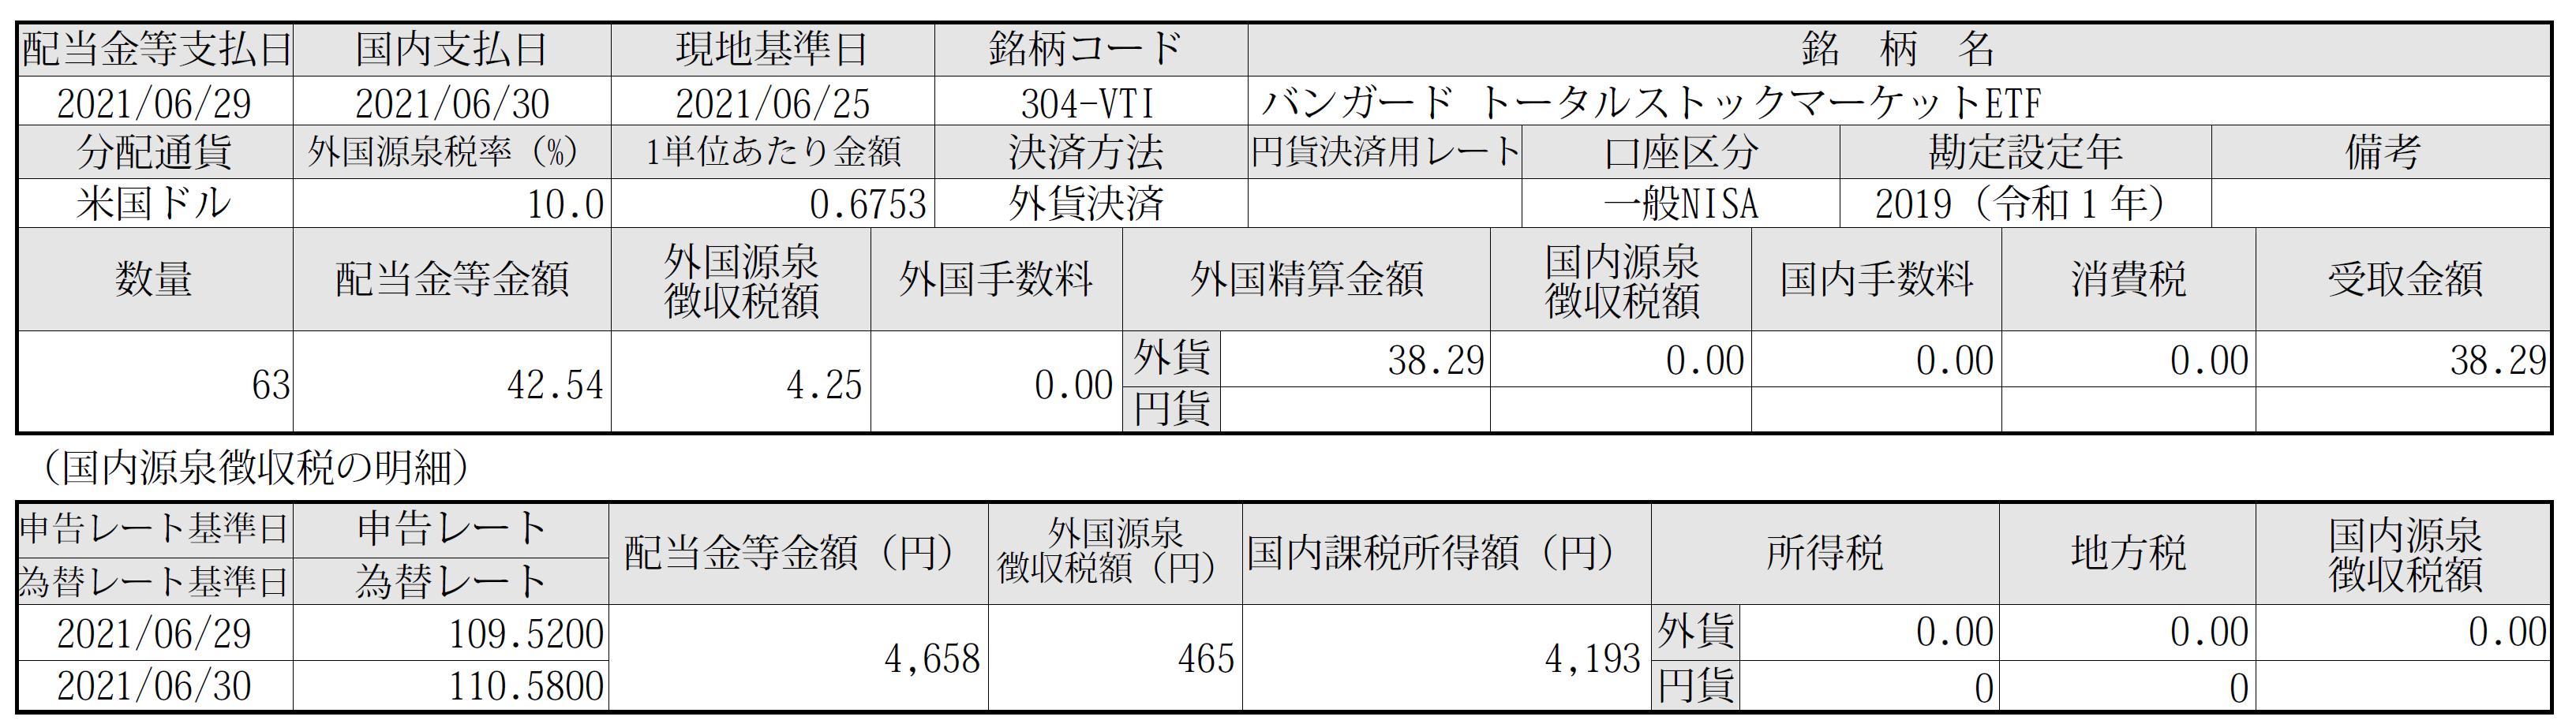 f:id:hodo-work:20210706193348p:plain